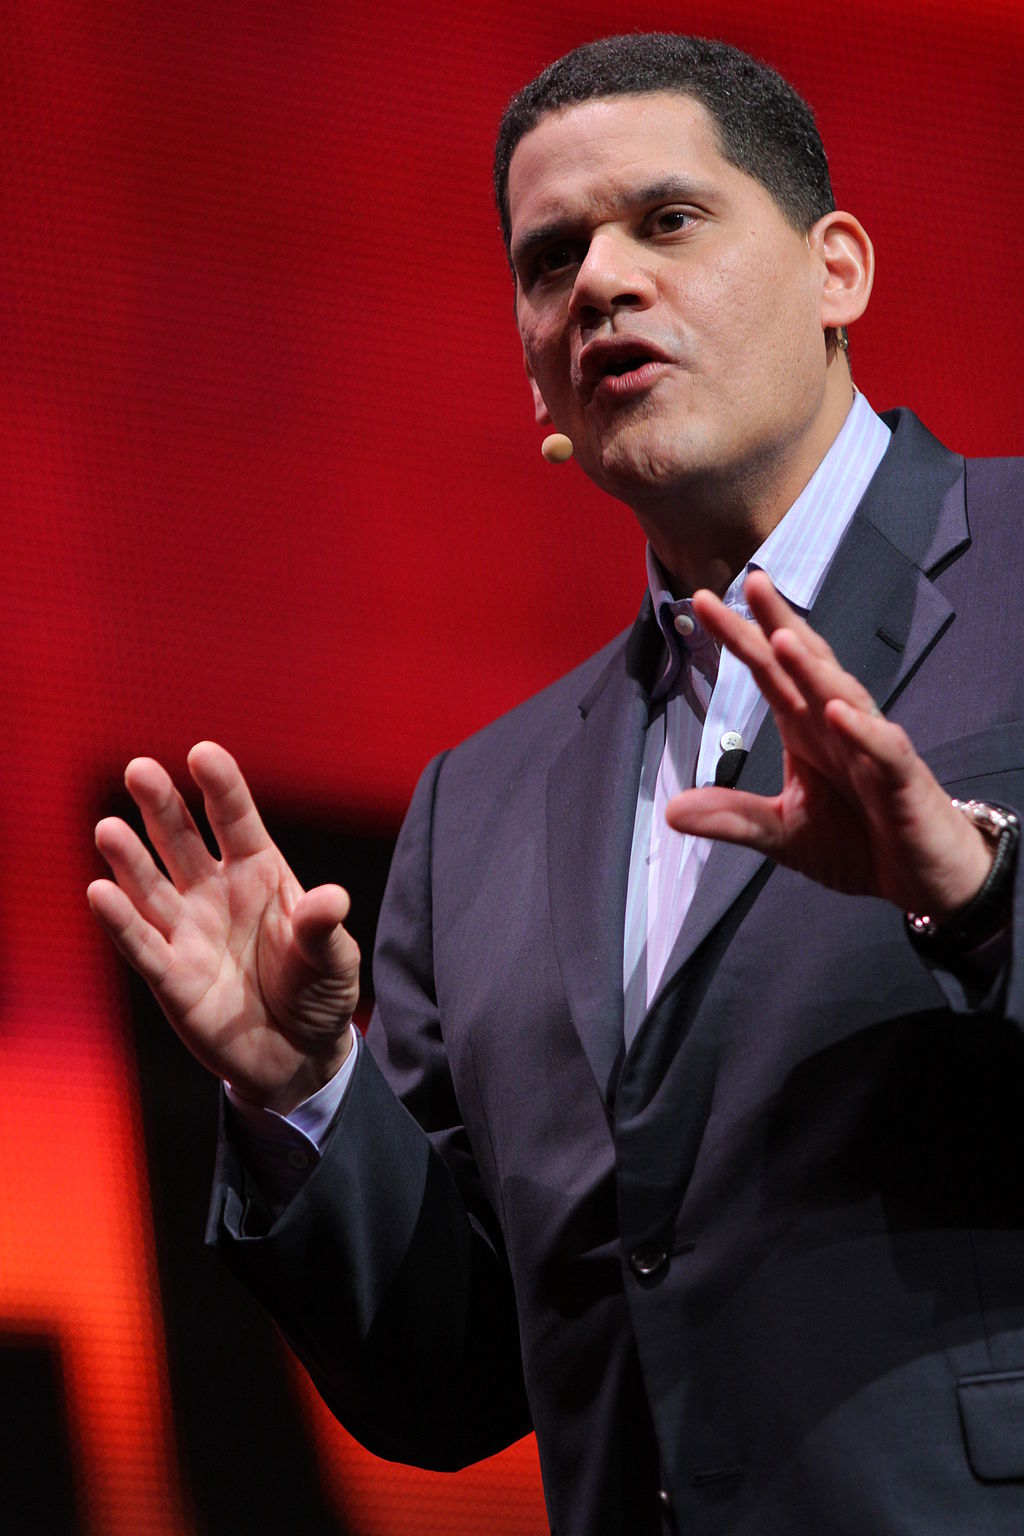 Former Nintendo US head Reggie Fils-Aime is one of the biggest names in gaming